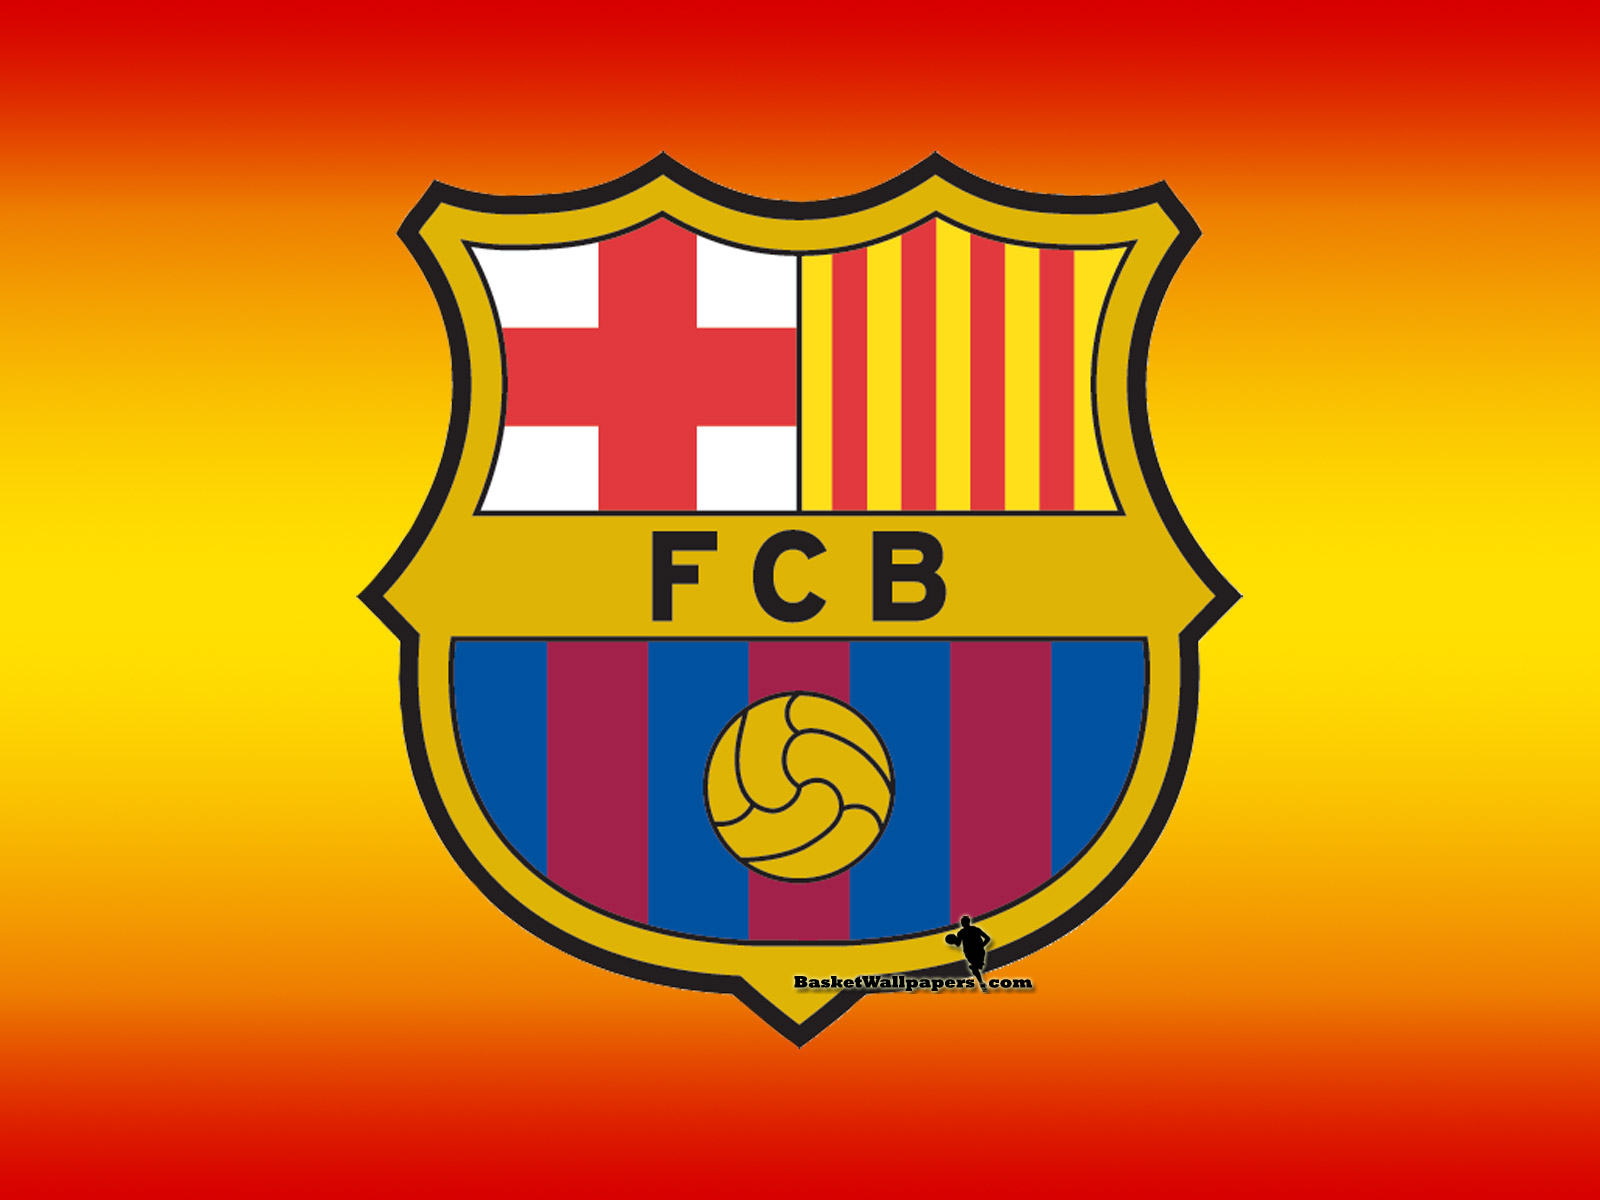 http://2.bp.blogspot.com/-Xs3nnDn2CTY/TxNQA2RUoCI/AAAAAAAAJBo/HrNRV06ad4E/s1600/Fondos-de-pantalla-Fc-Barcelona-wallpapers-f%25C3%25B9tbol.jpg